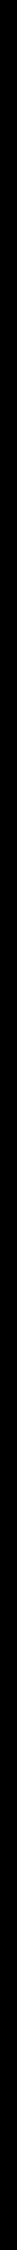 black copy 7.jpg